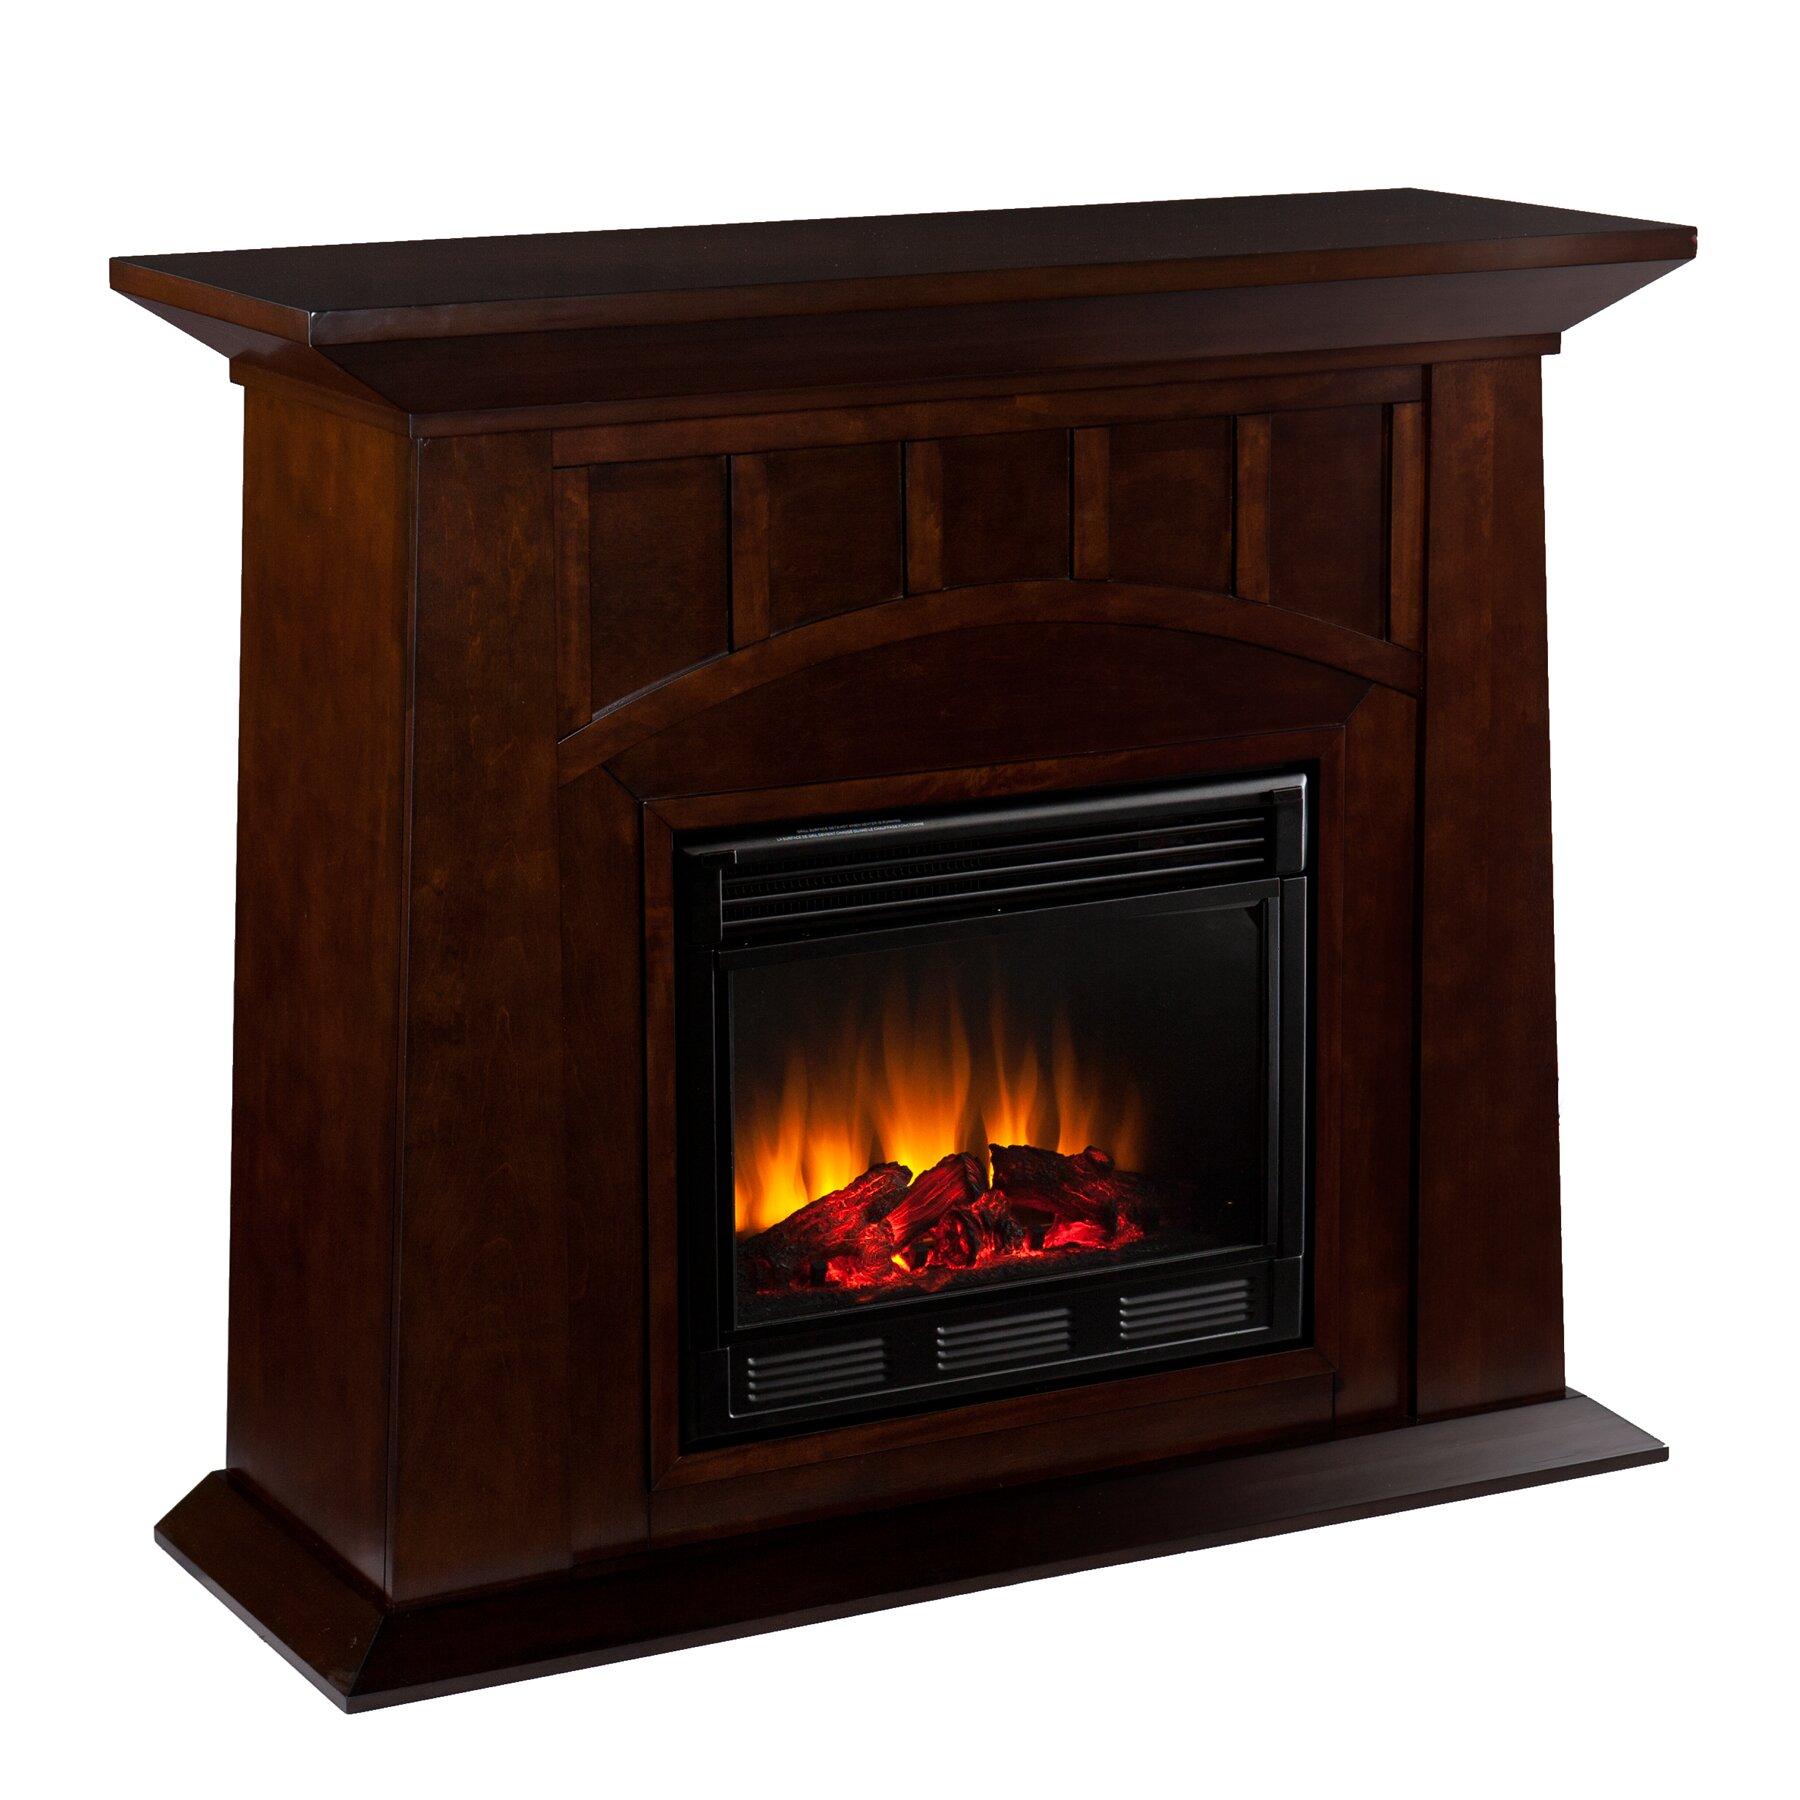 Wildon Home Manchester Electric Fireplace Reviews Wayfair